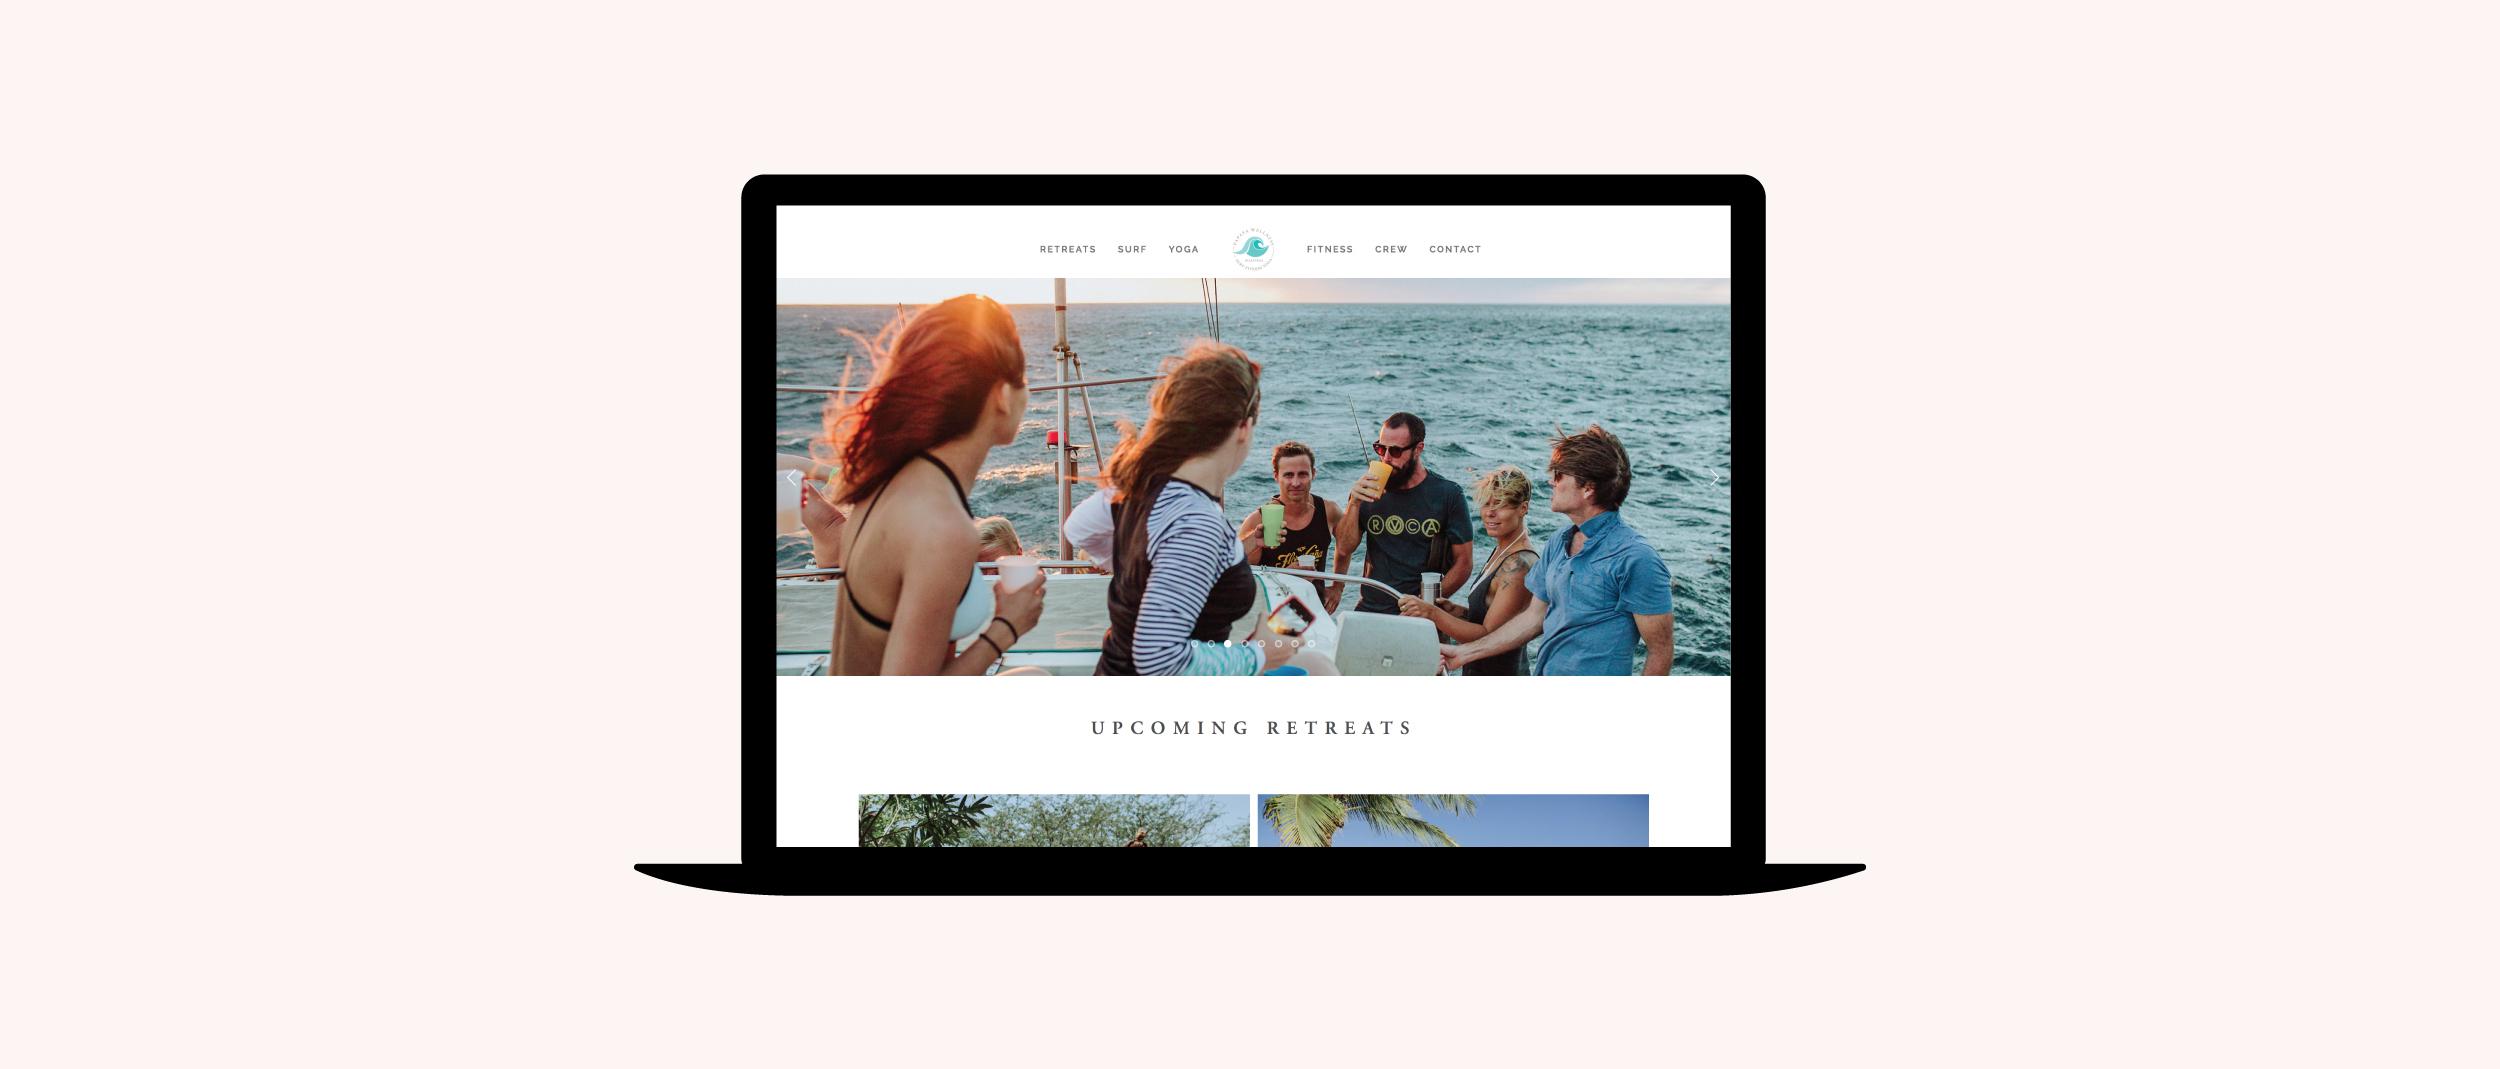 PapayaWellness-web-design-megan-munro.jpg